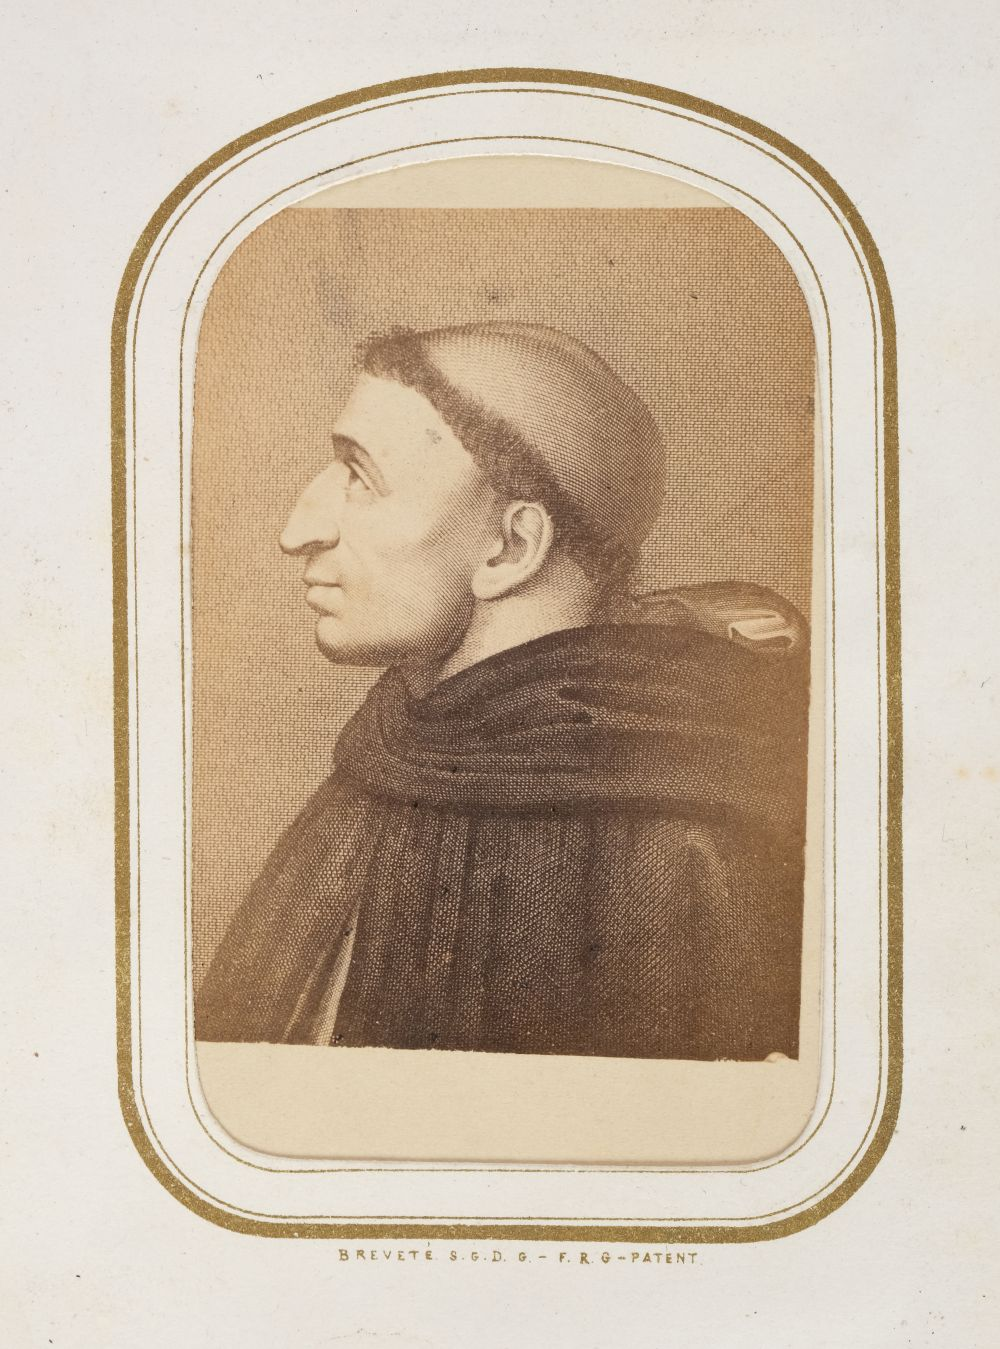 * Cartes de visite. A cartes-de-visite album, c. 1860s/1880s - Image 16 of 18